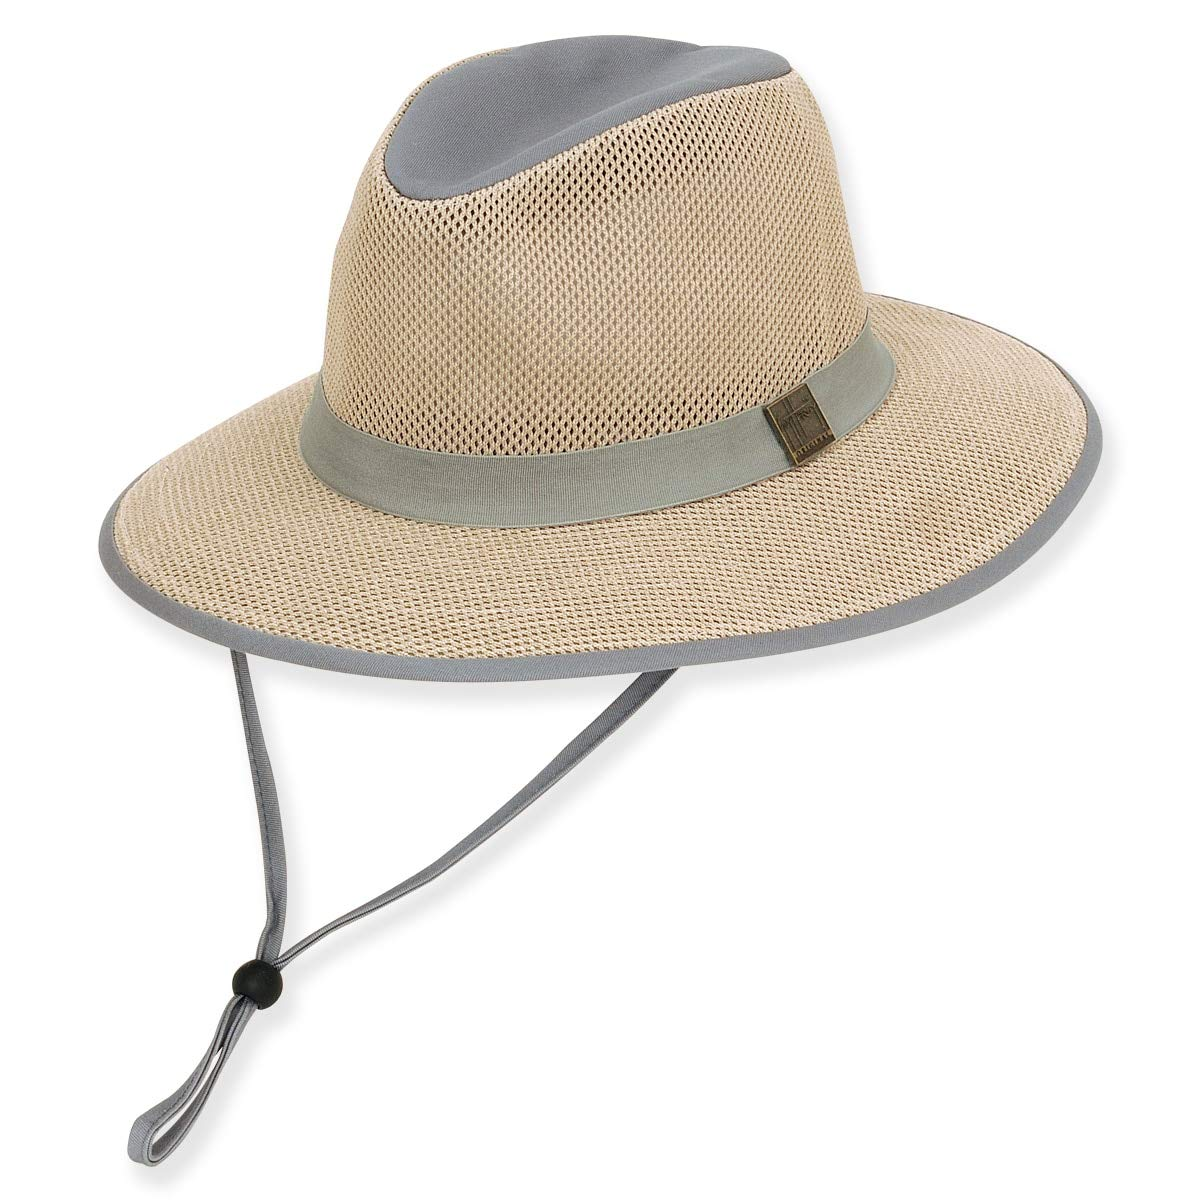 7bf4e6845fa63 Guy Harvey Mens Mesh Fishing Hat One Size Black at Amazon Men s Clothing  store